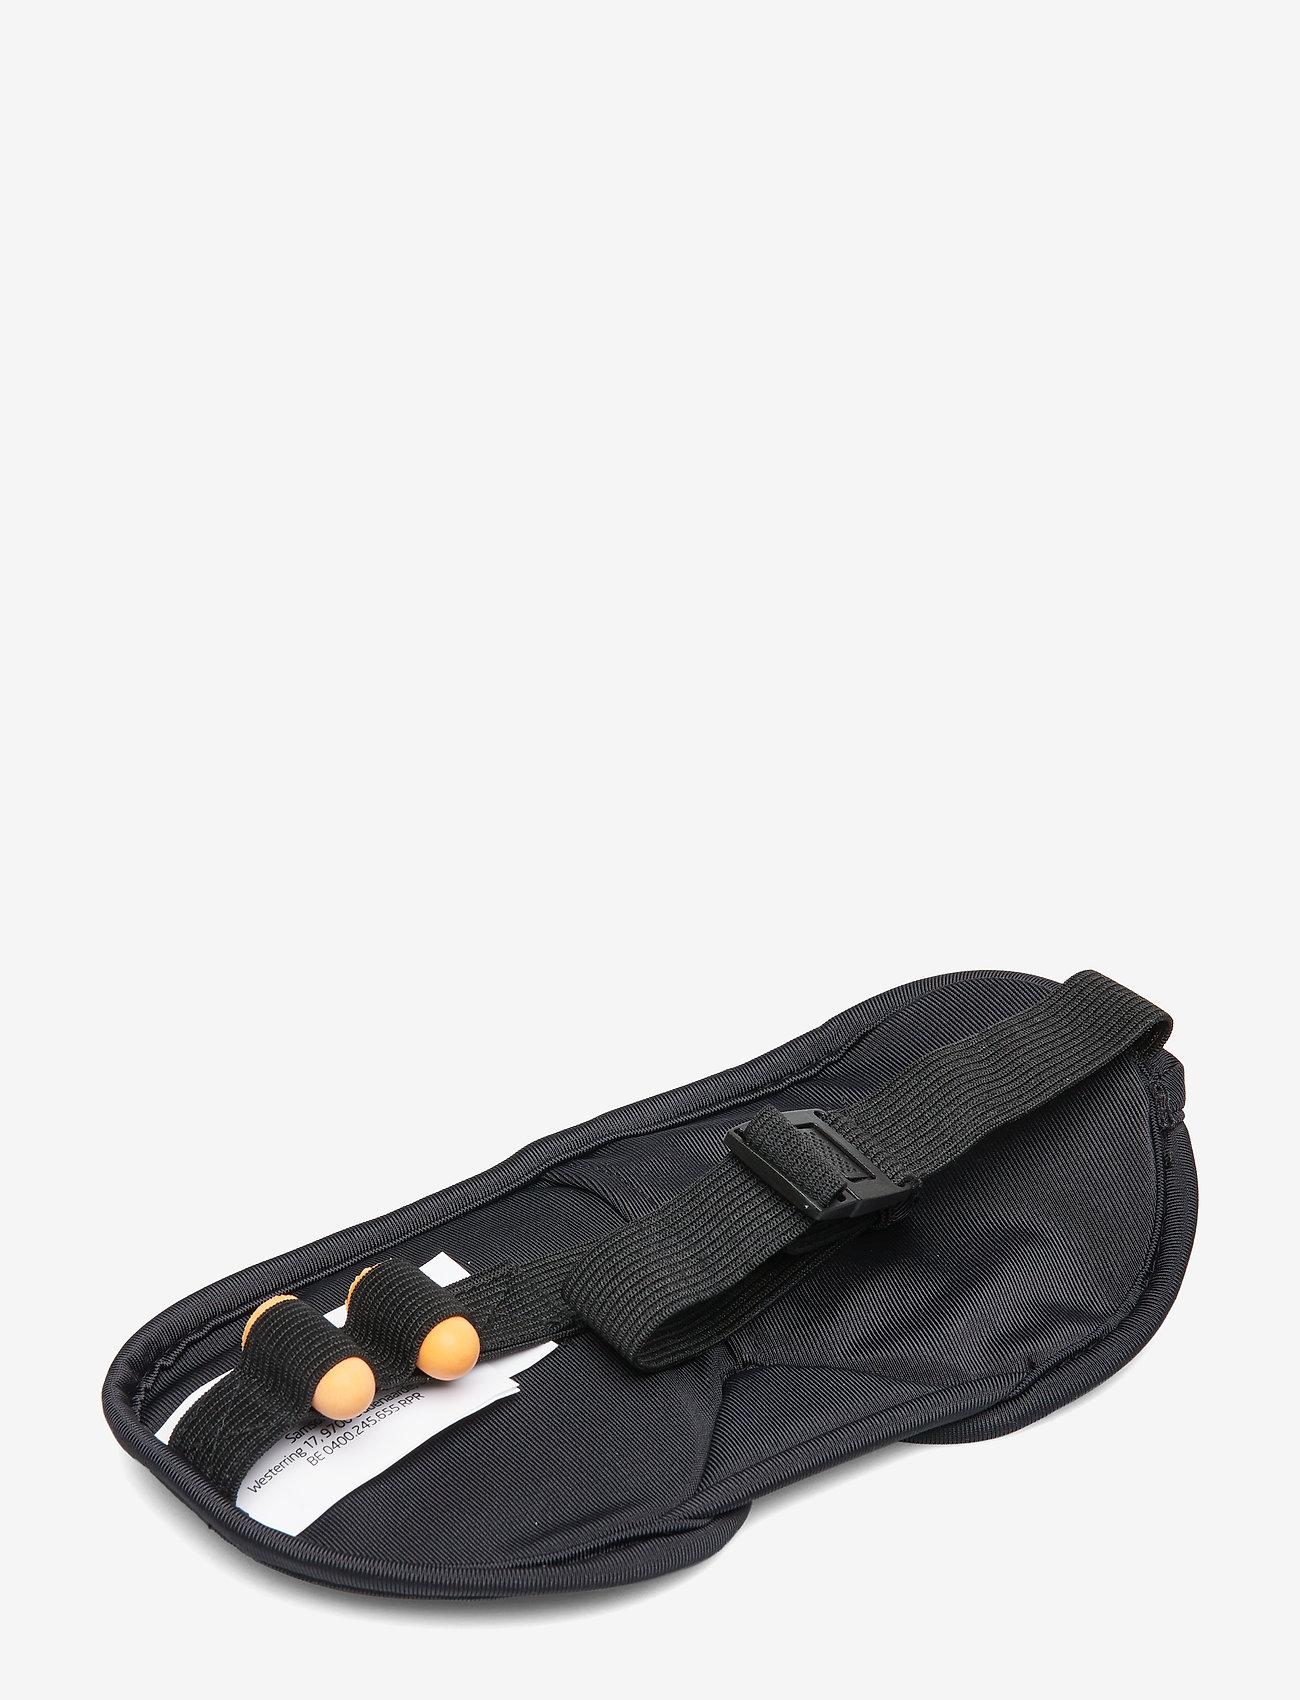 Samsonite - Comfort Travelling Eye Mask And Earplugs - travel accessories - black - 1